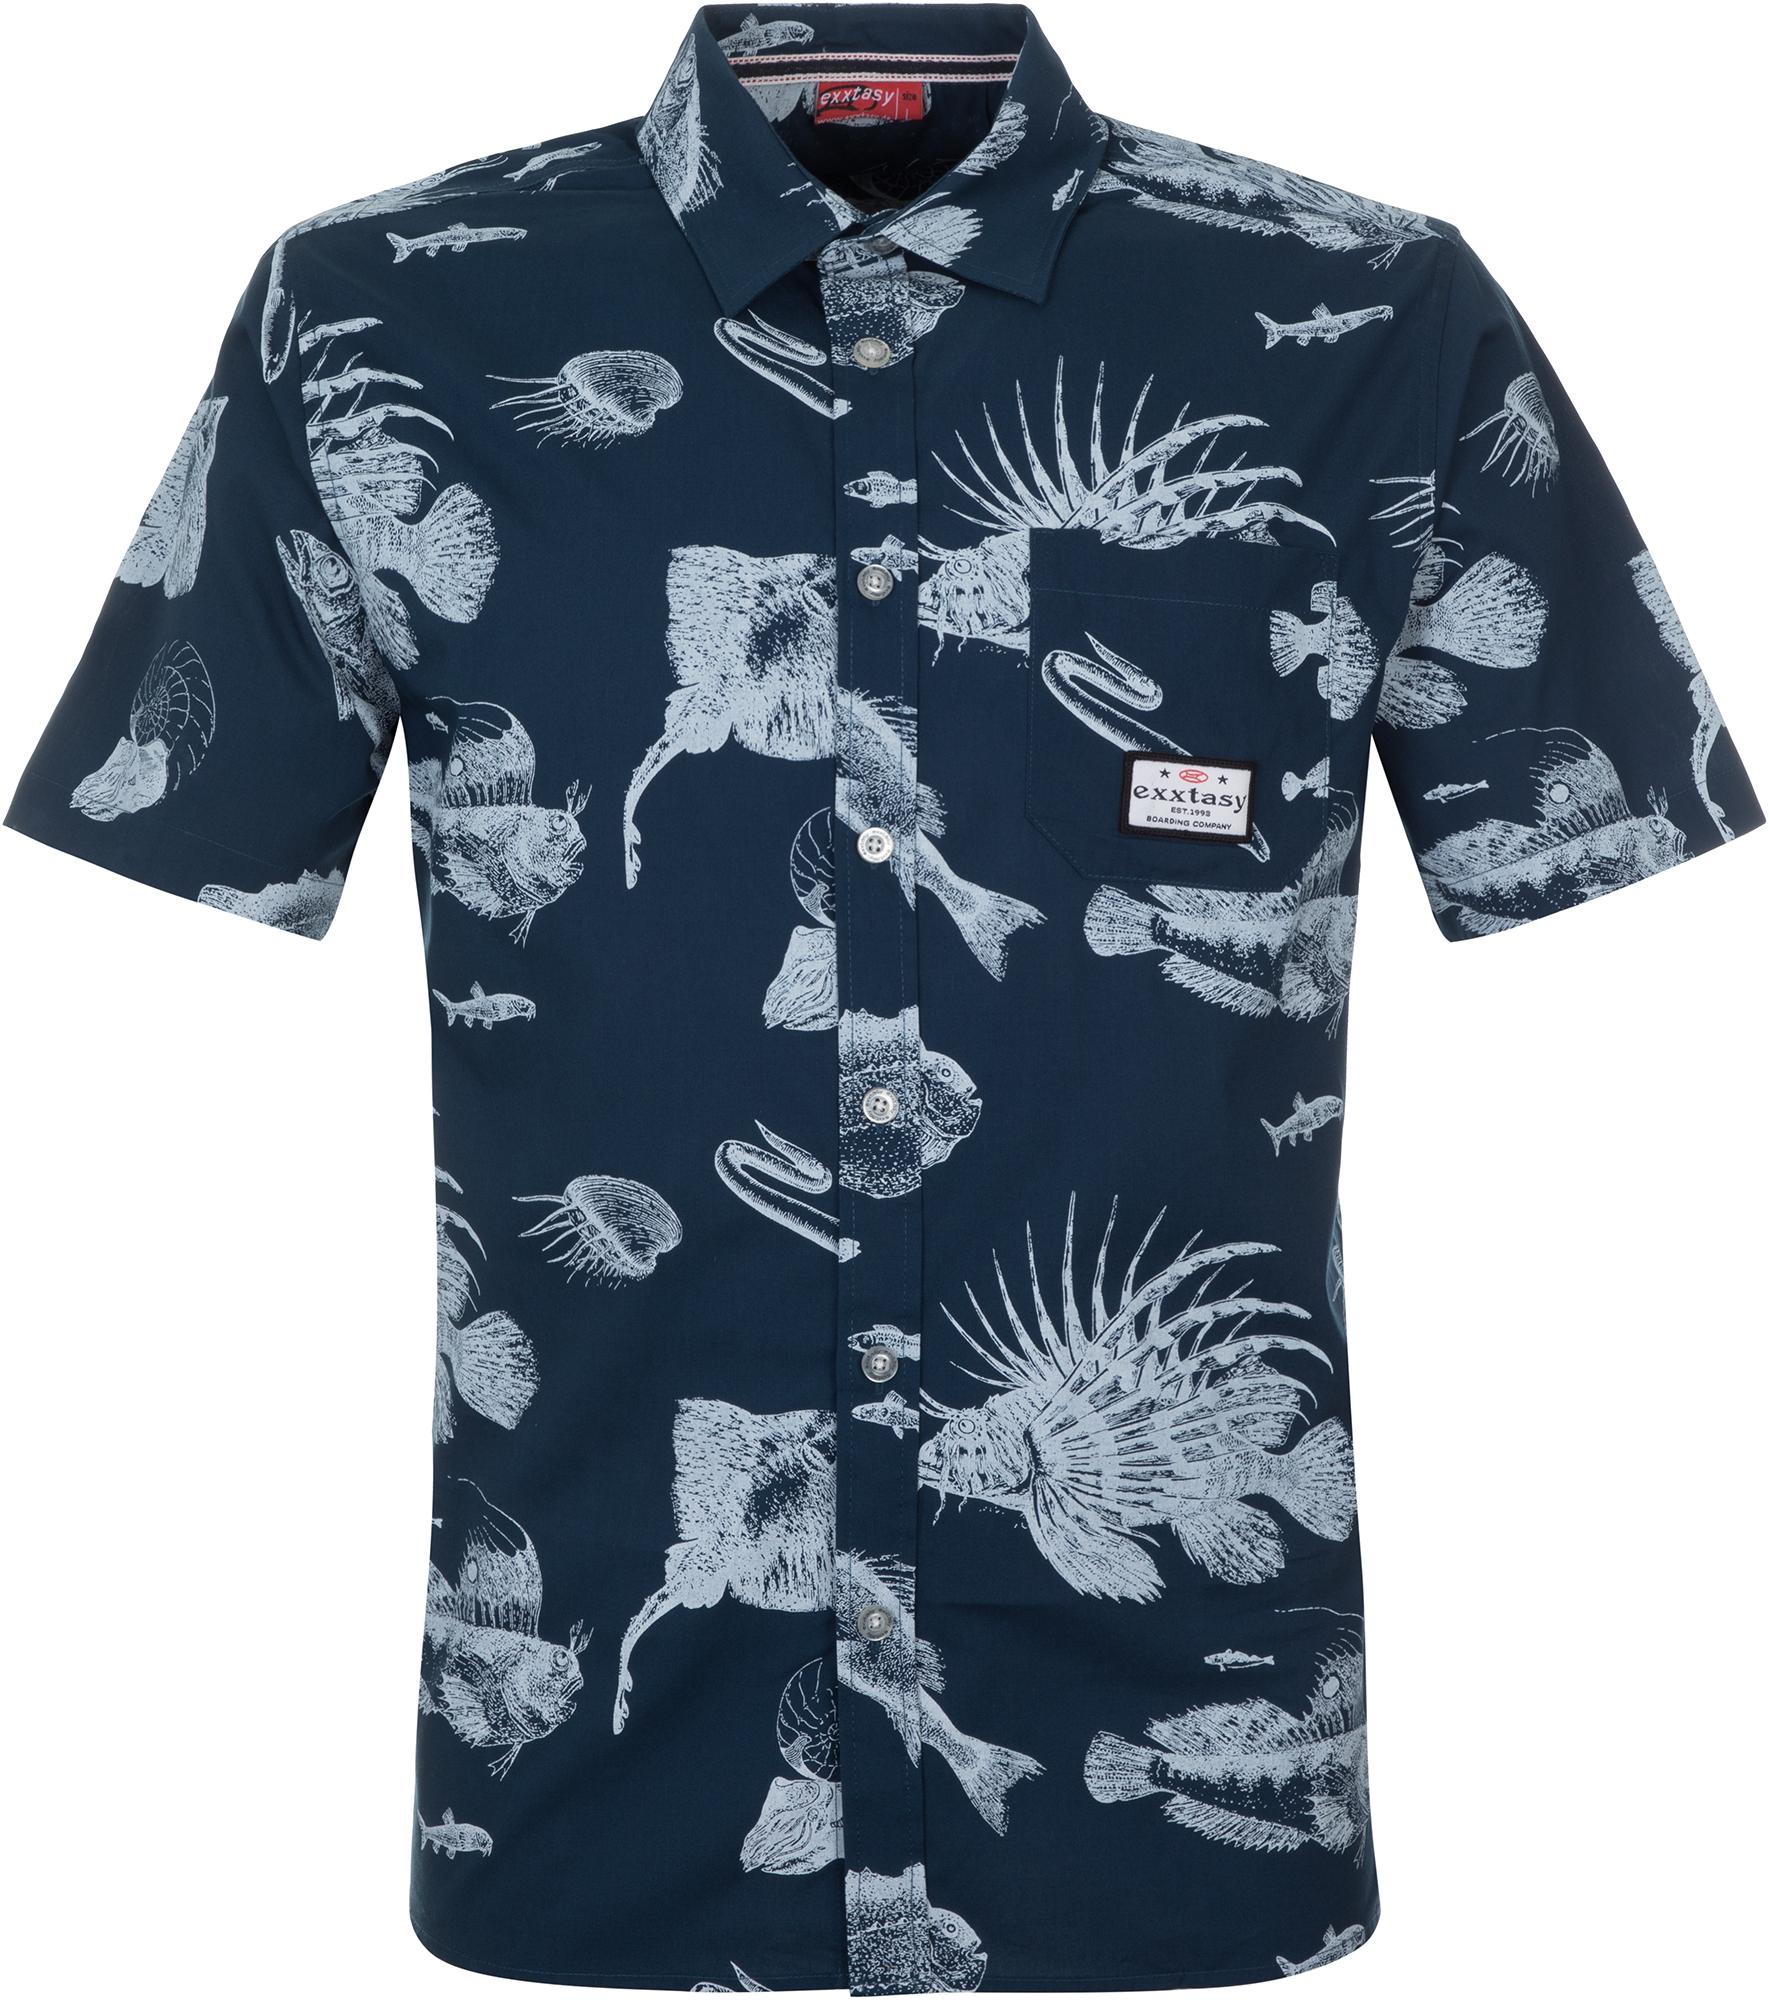 Exxtasy Рубашка мужская Exxtasy Concord, размер 50-52